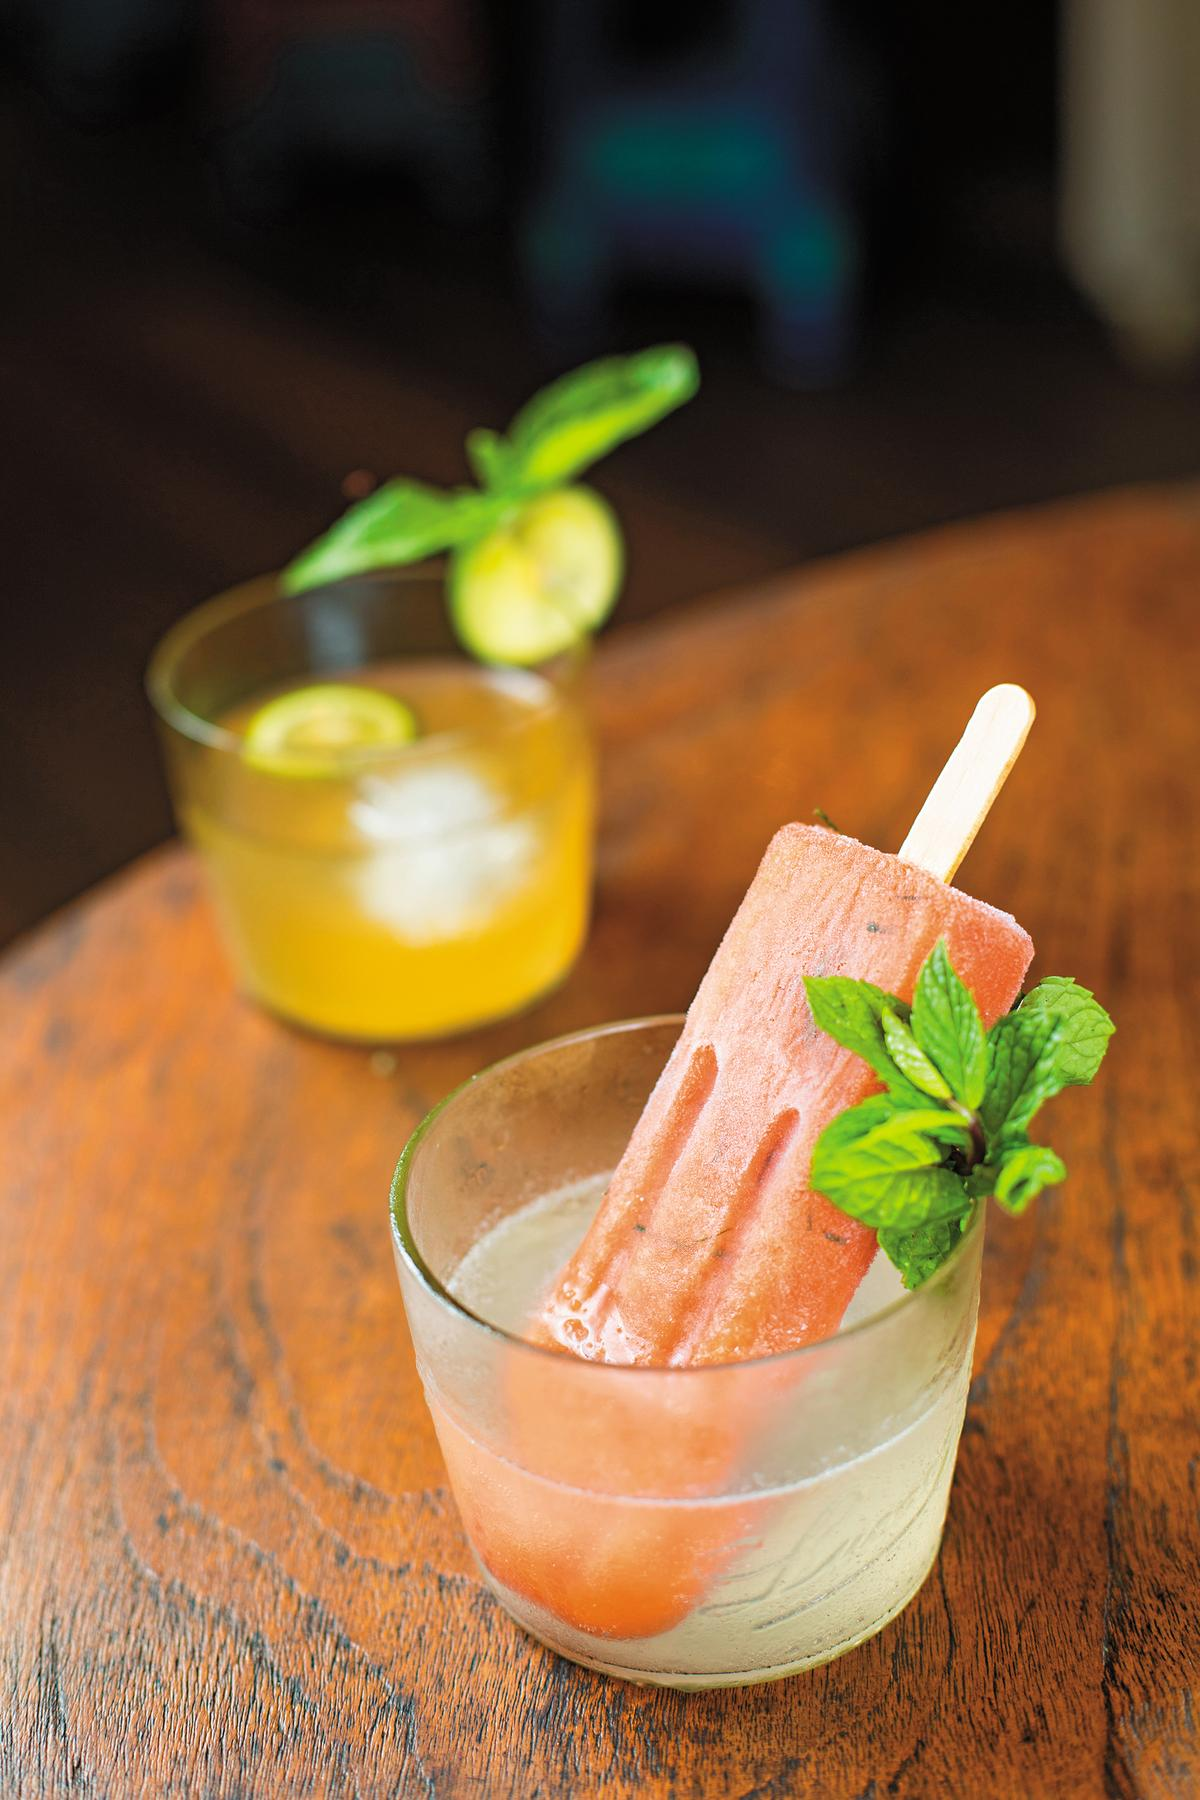 「Malu Malu」用伏特加當調酒基底,放上西瓜口味的冰棒。(印尼盾85,000元/杯,約NT$192)